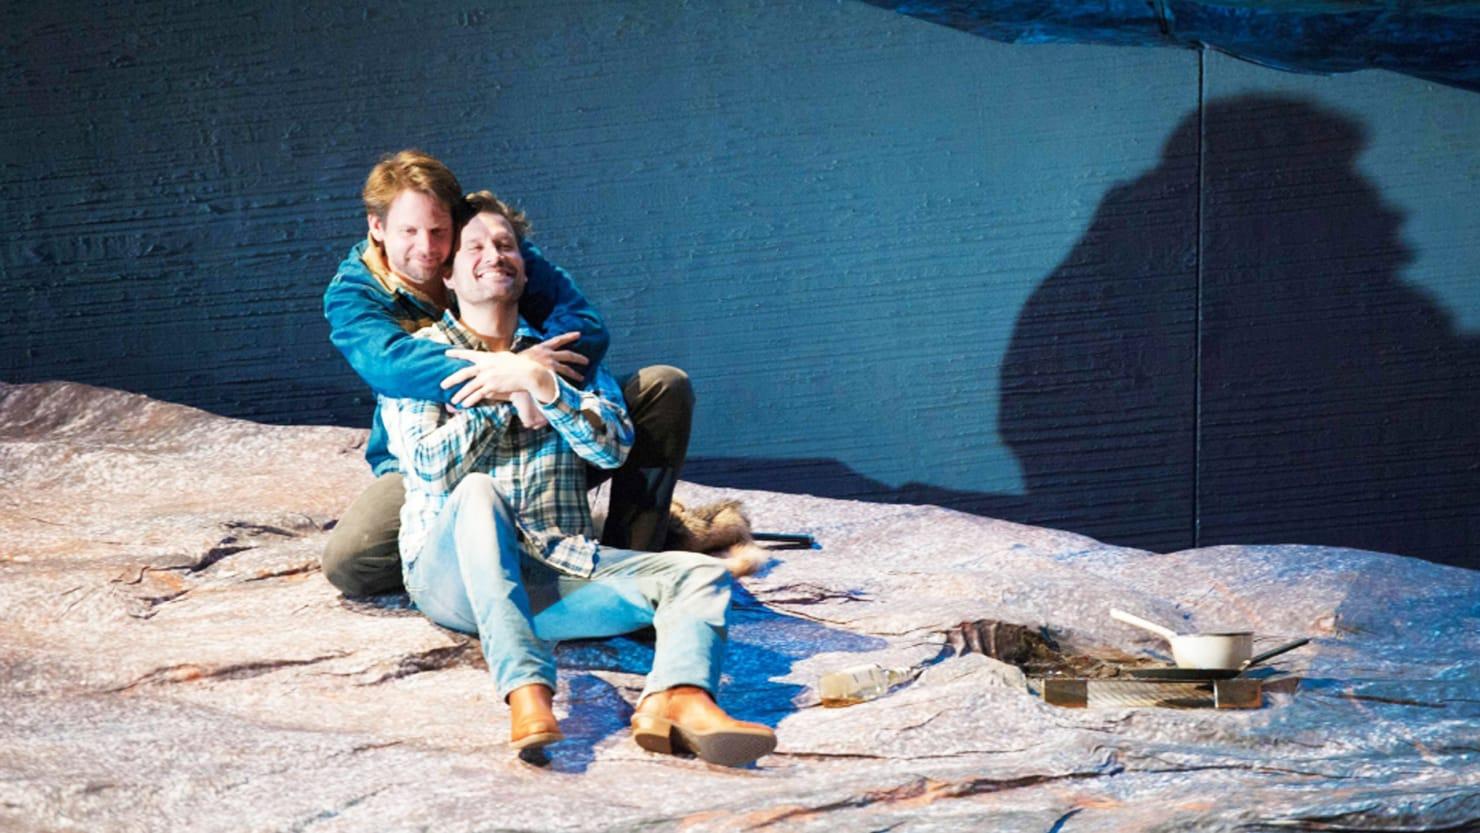 How Landmark LGBT Movie 'Brokeback Mountain' Became an Opera